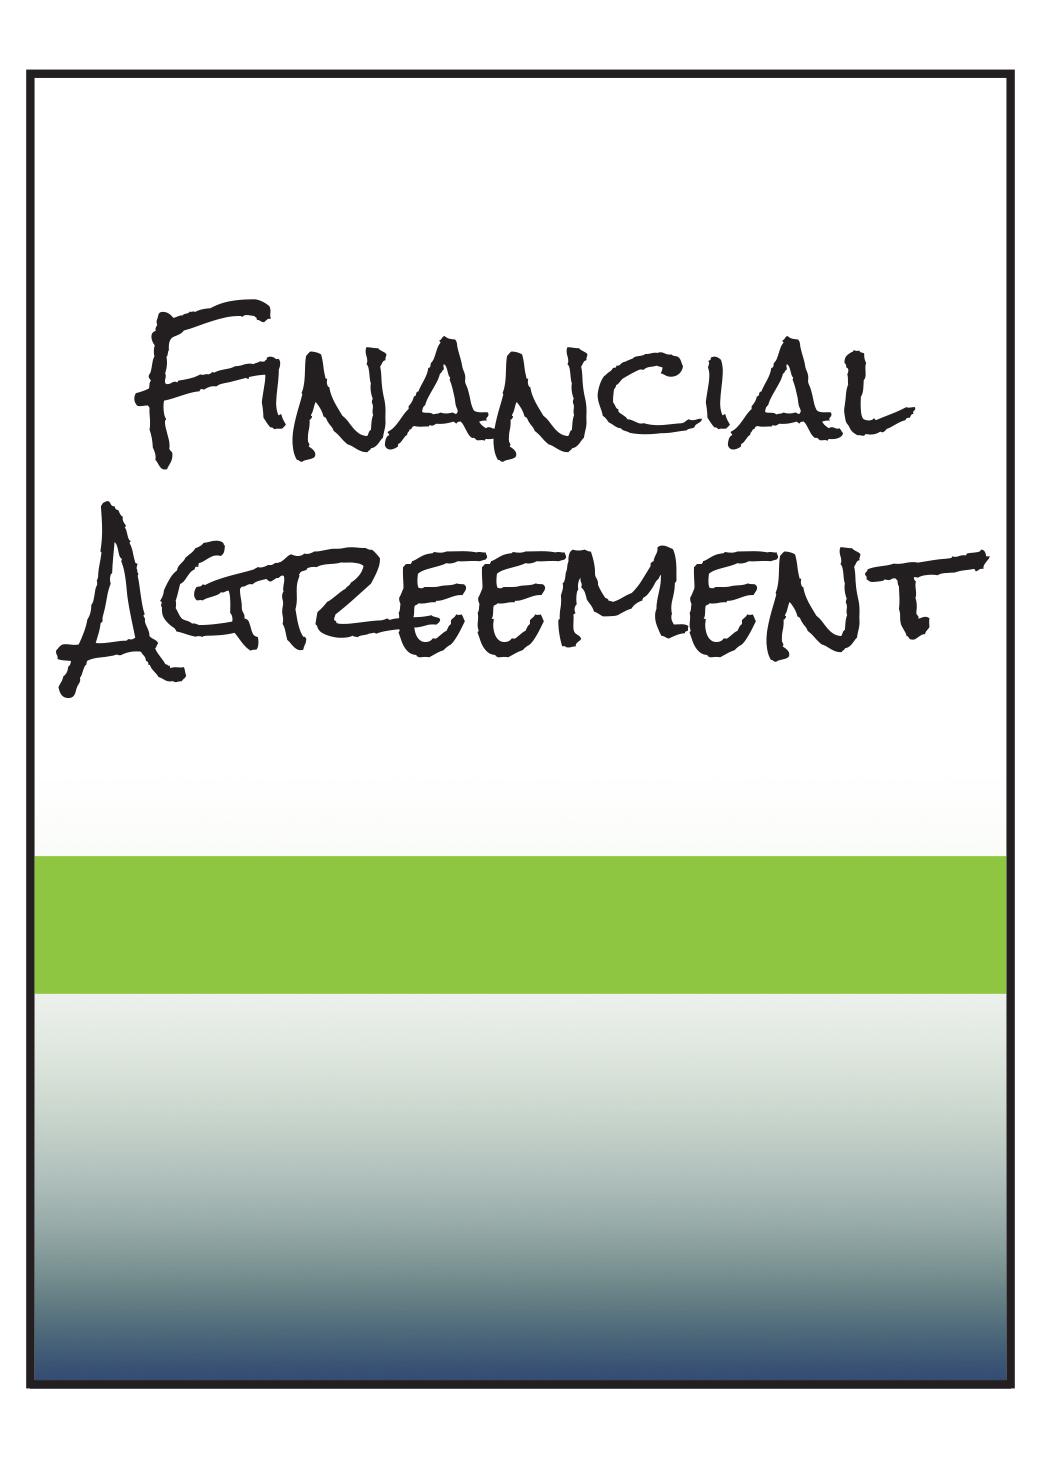 cochrane-Financial-agreement.jpg